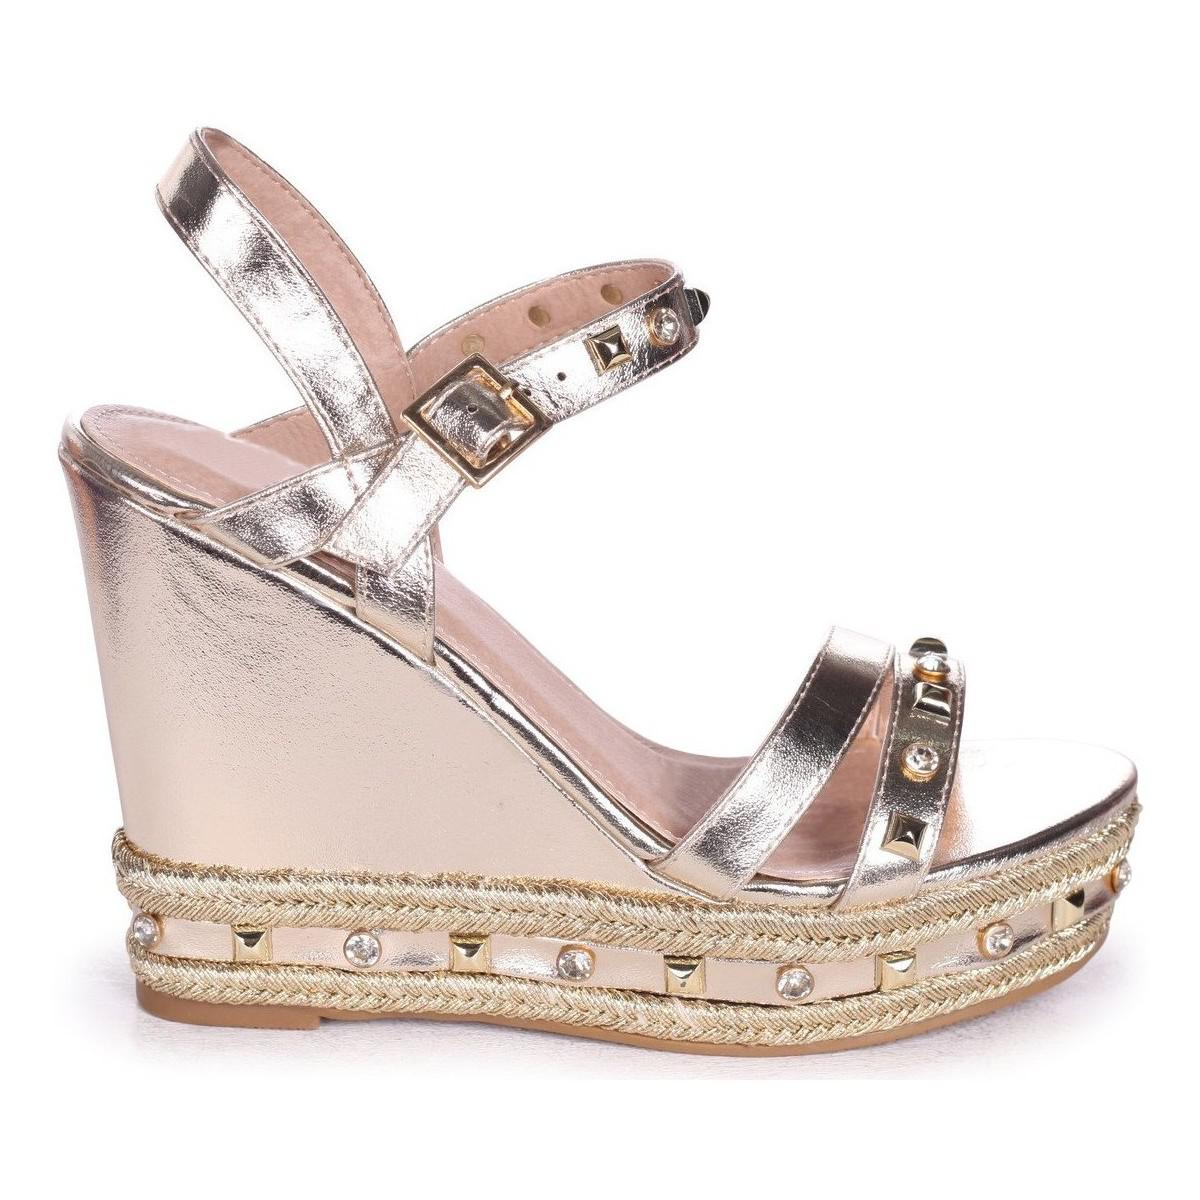 46c21ae0768 Linzi Carmen Women s Sandals In Gold in Metallic - Lyst